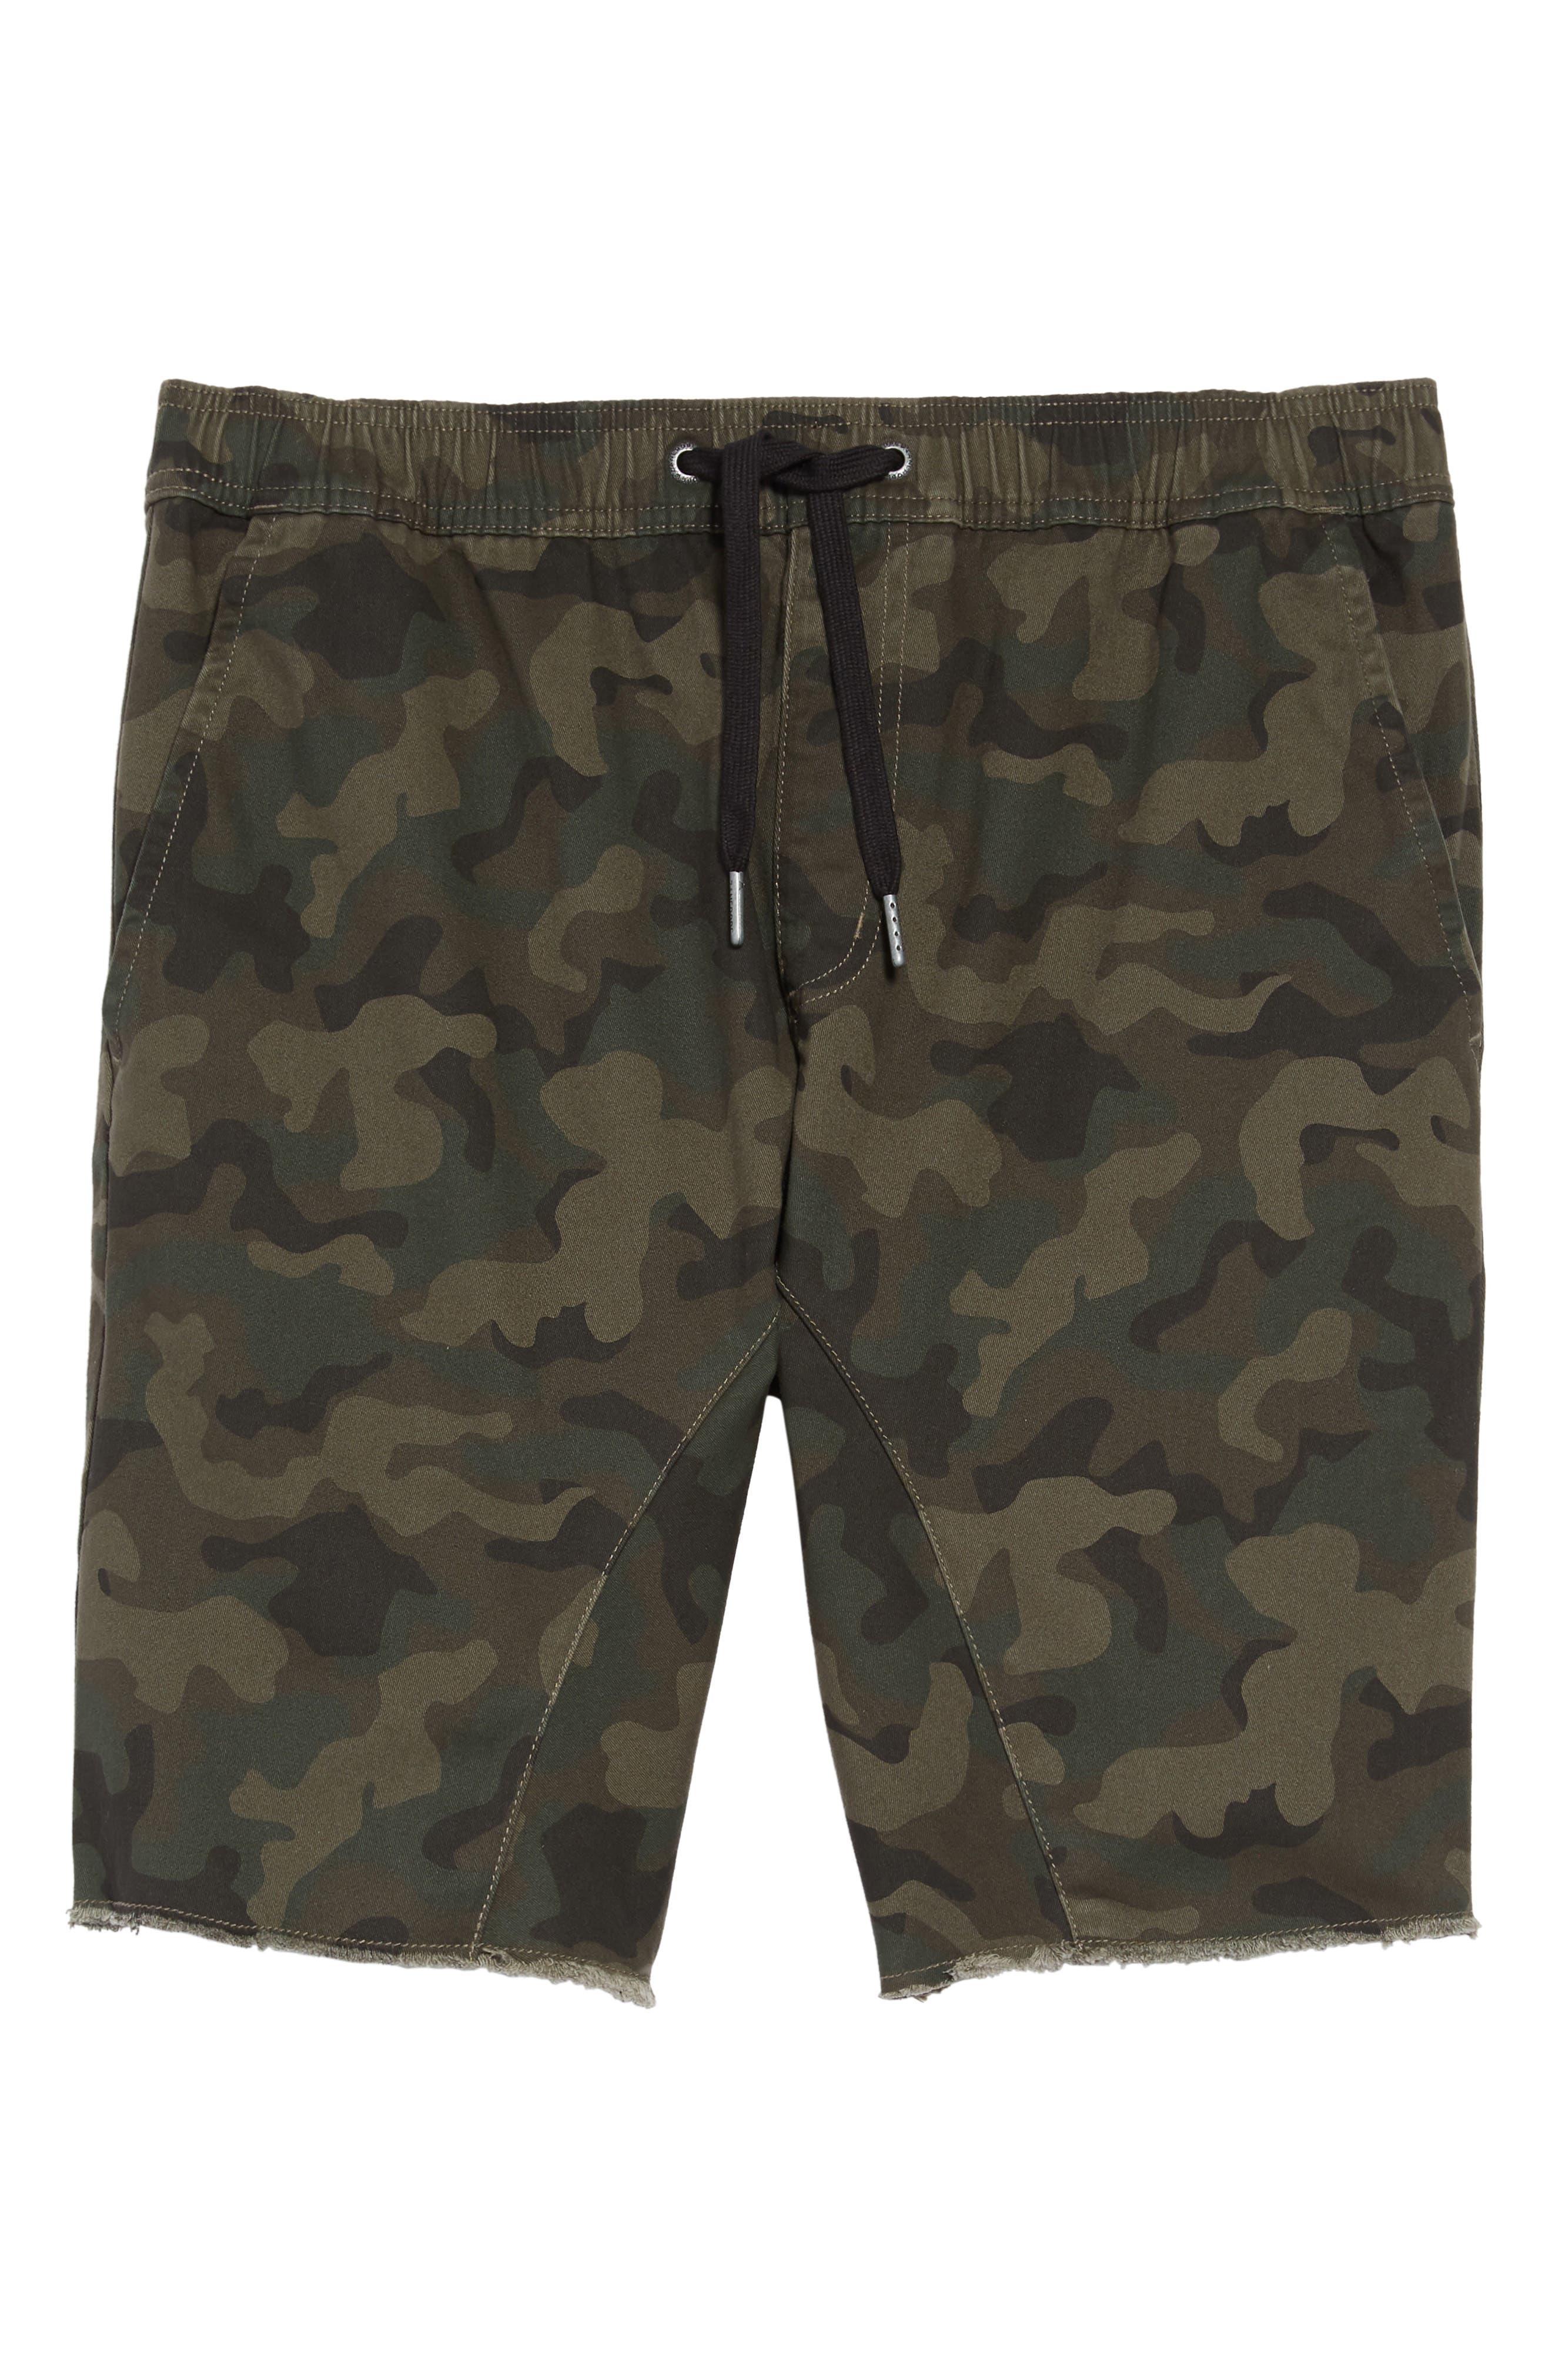 Men's Zanerobe Sureshot Camo Print Shorts